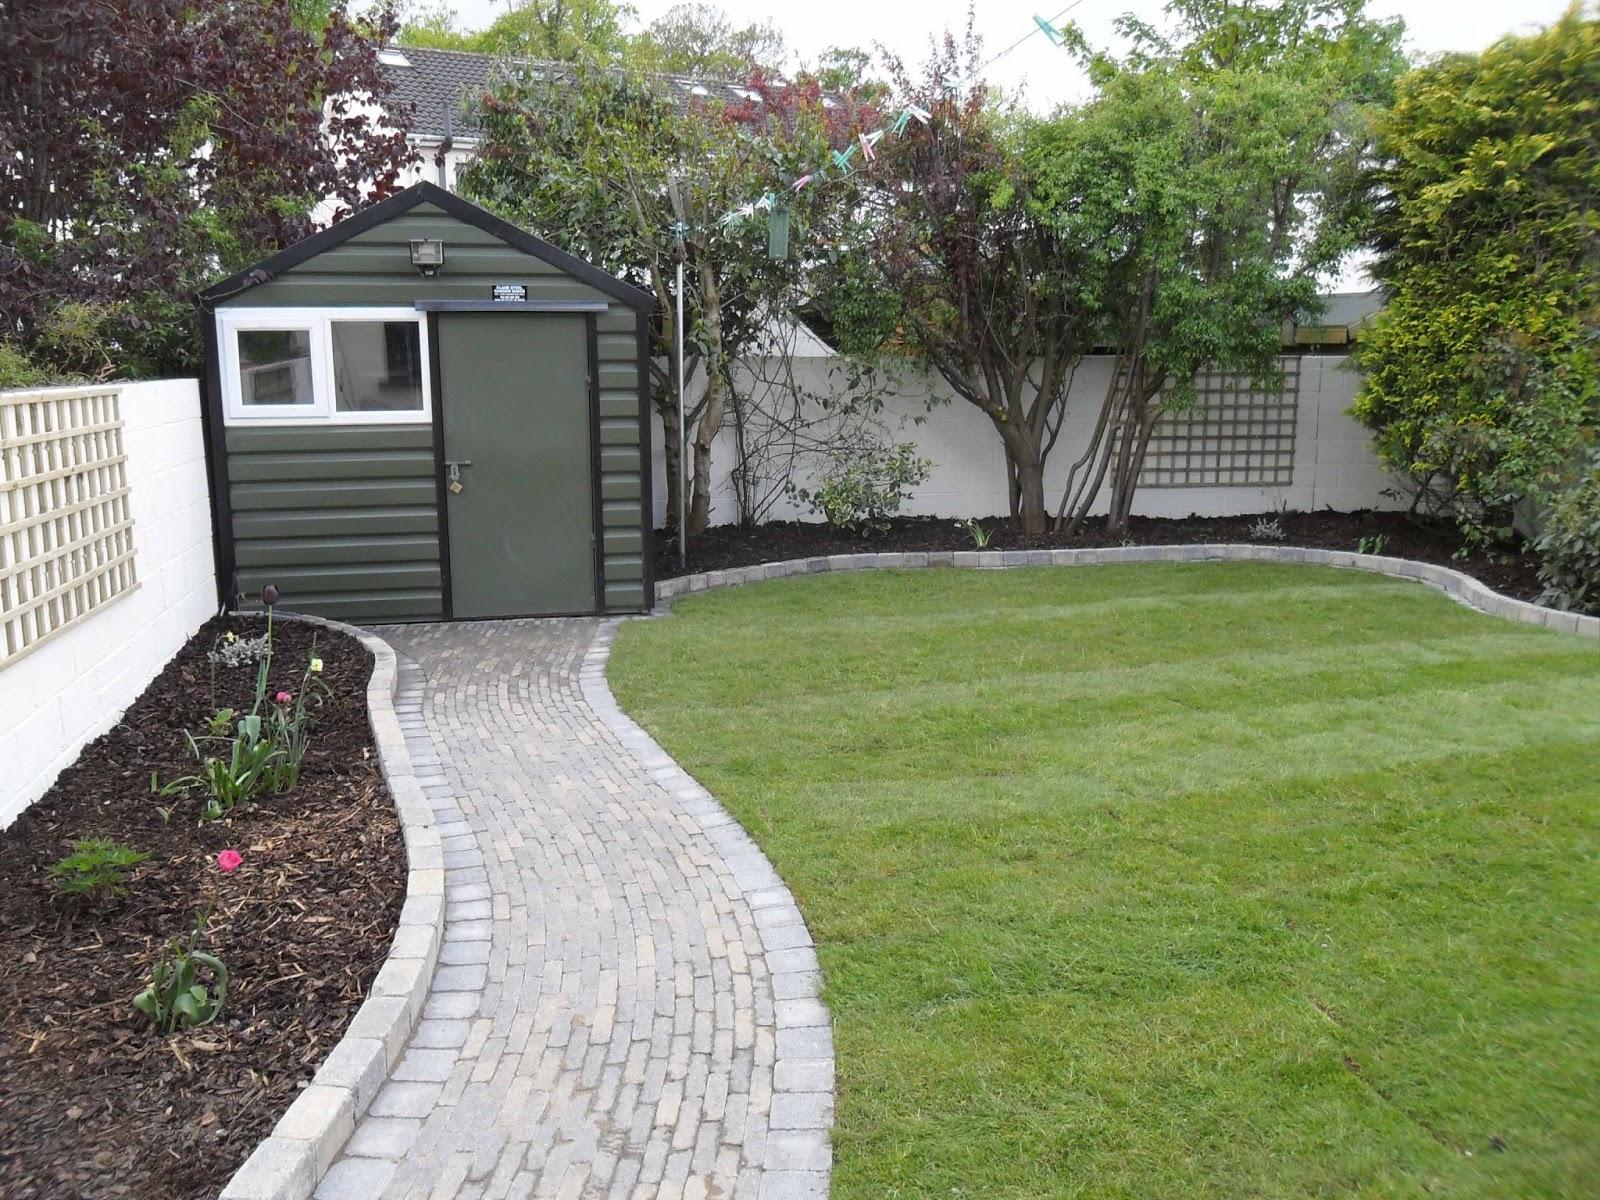 Greenart landscapes garden design construction and for Garden path designs uk